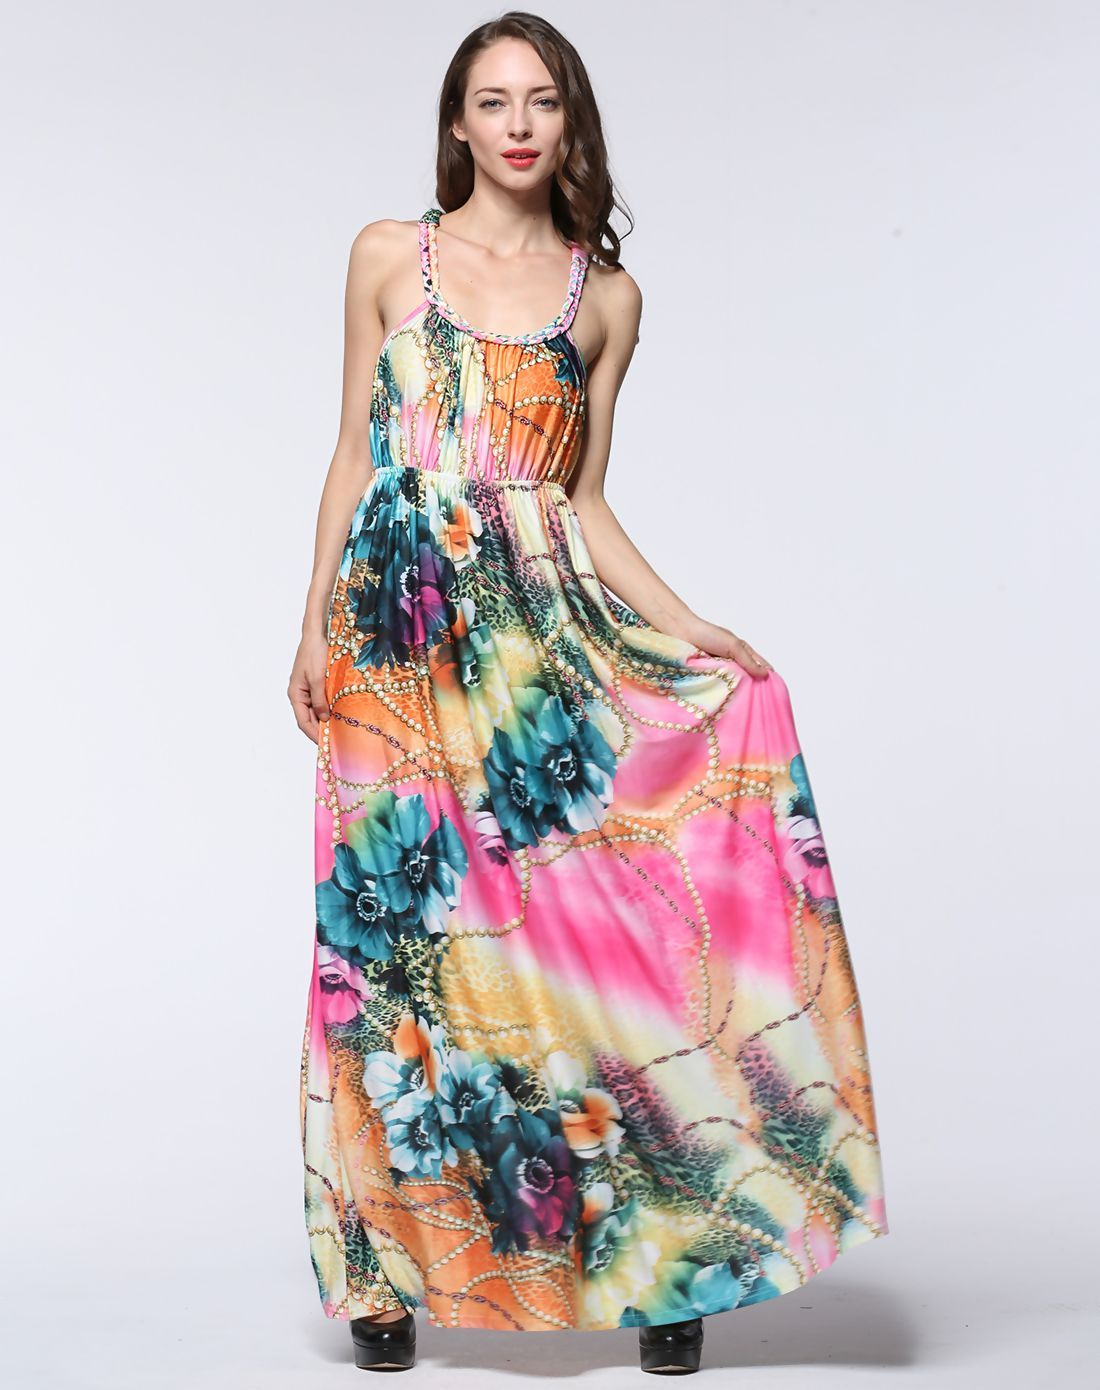 Adorewe vipme swing dressesdesigner chao meng plus boho